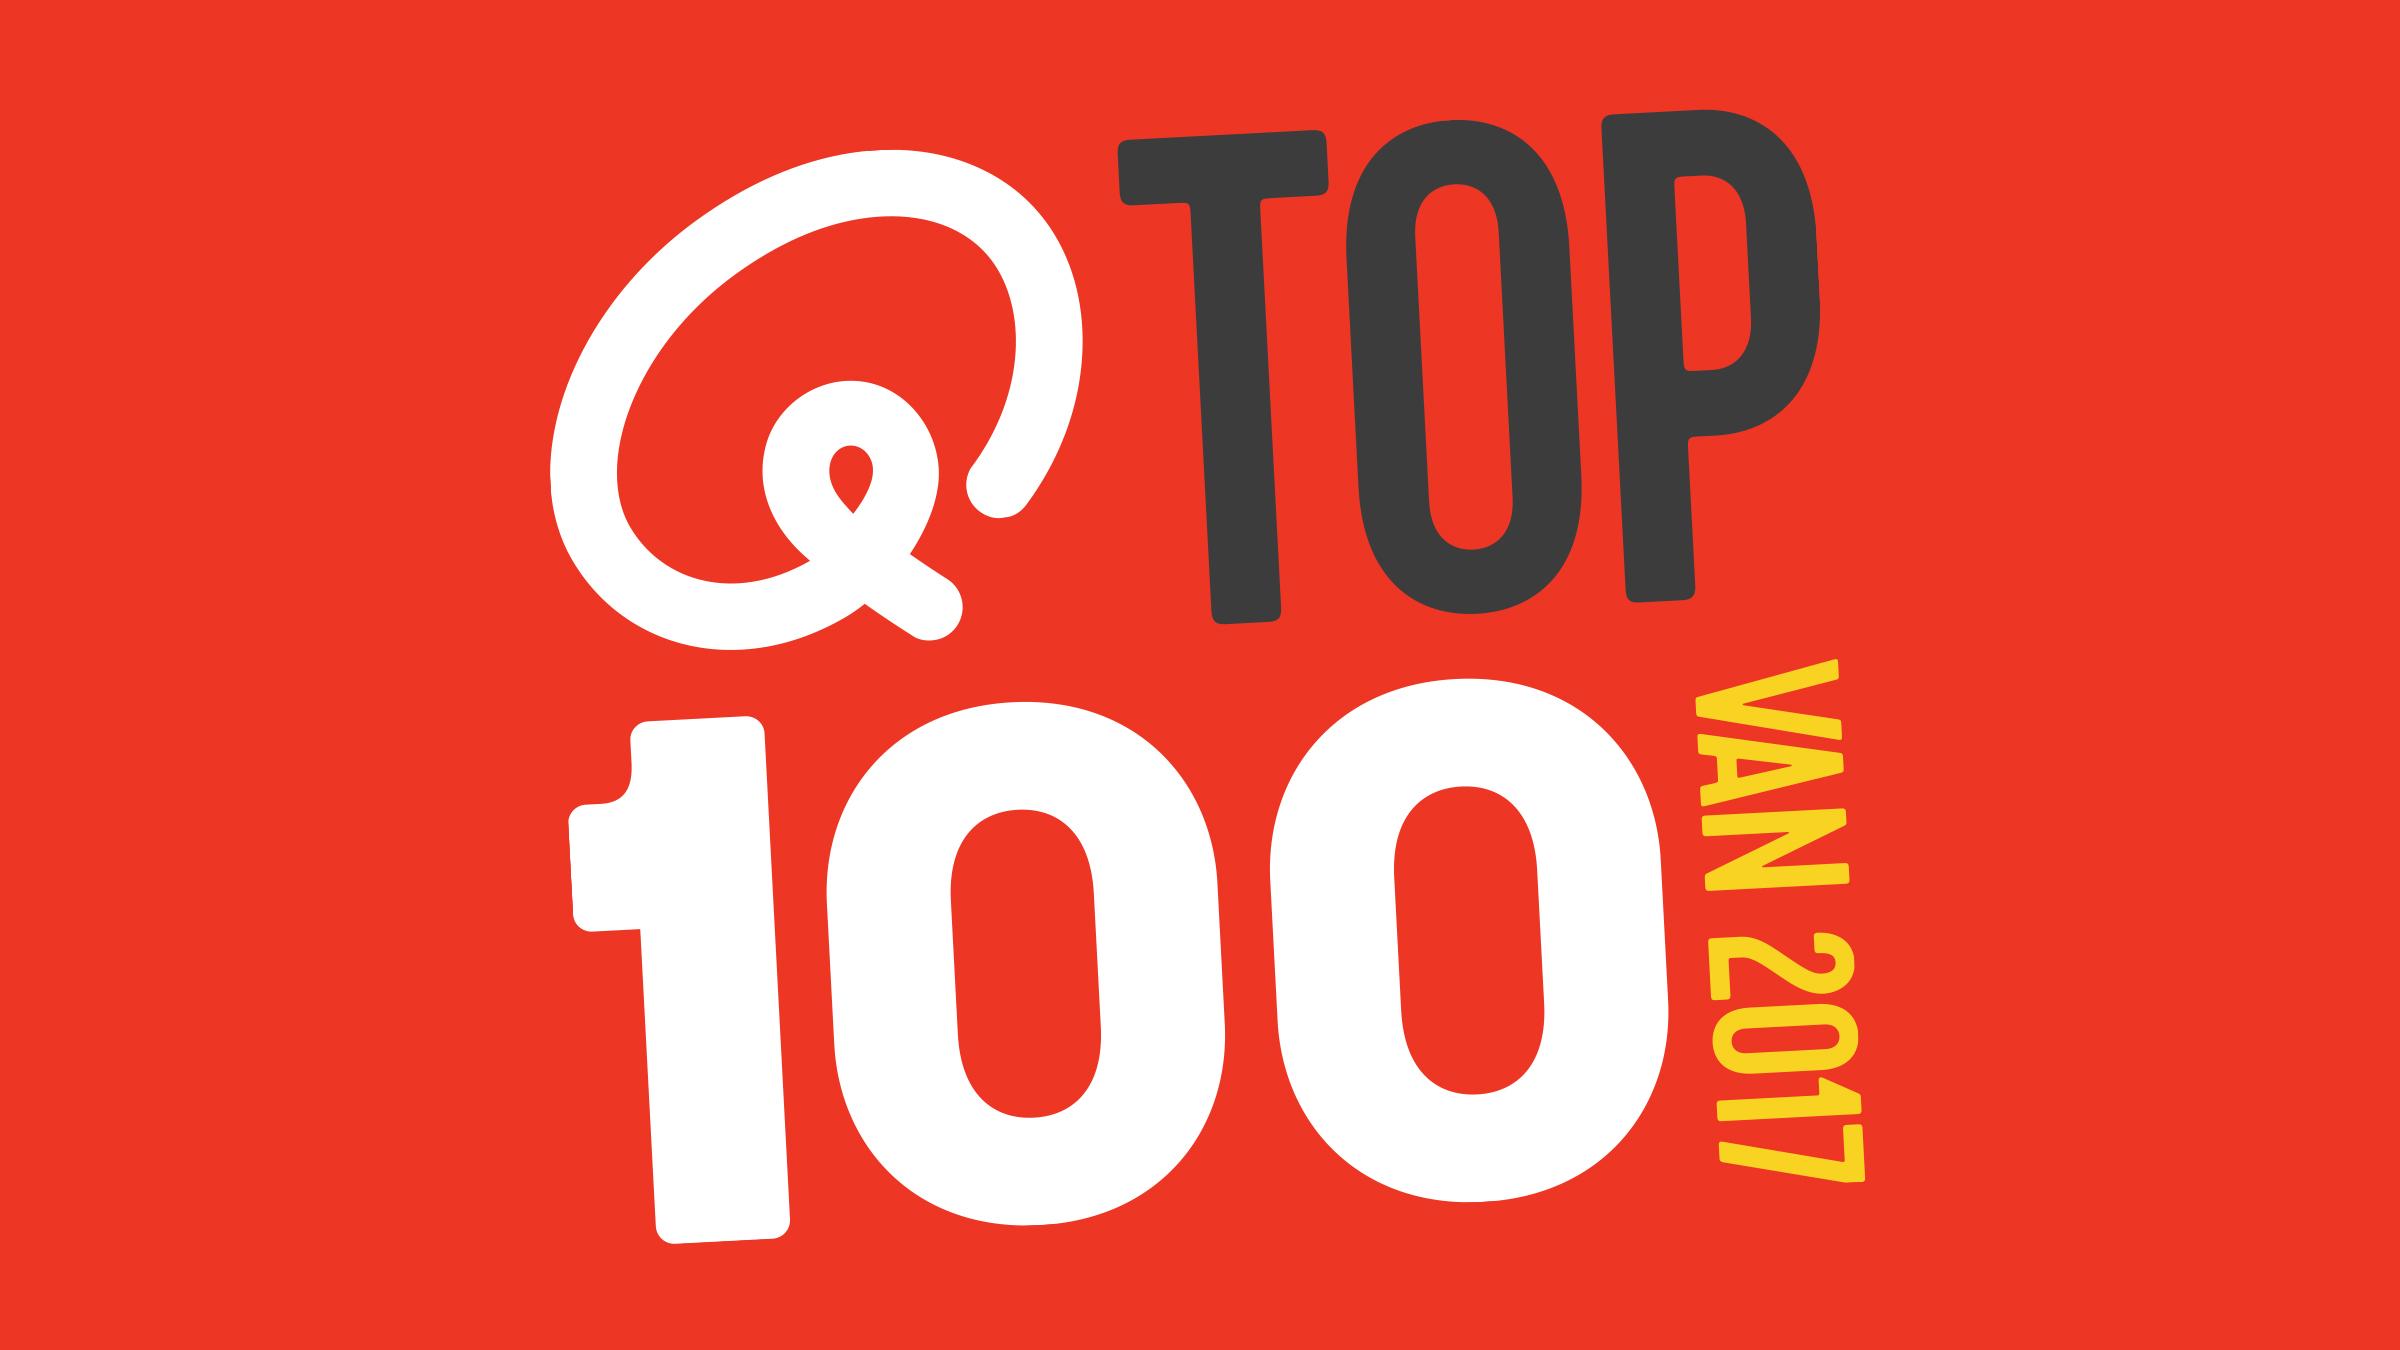 Qmusic teaser qtop100